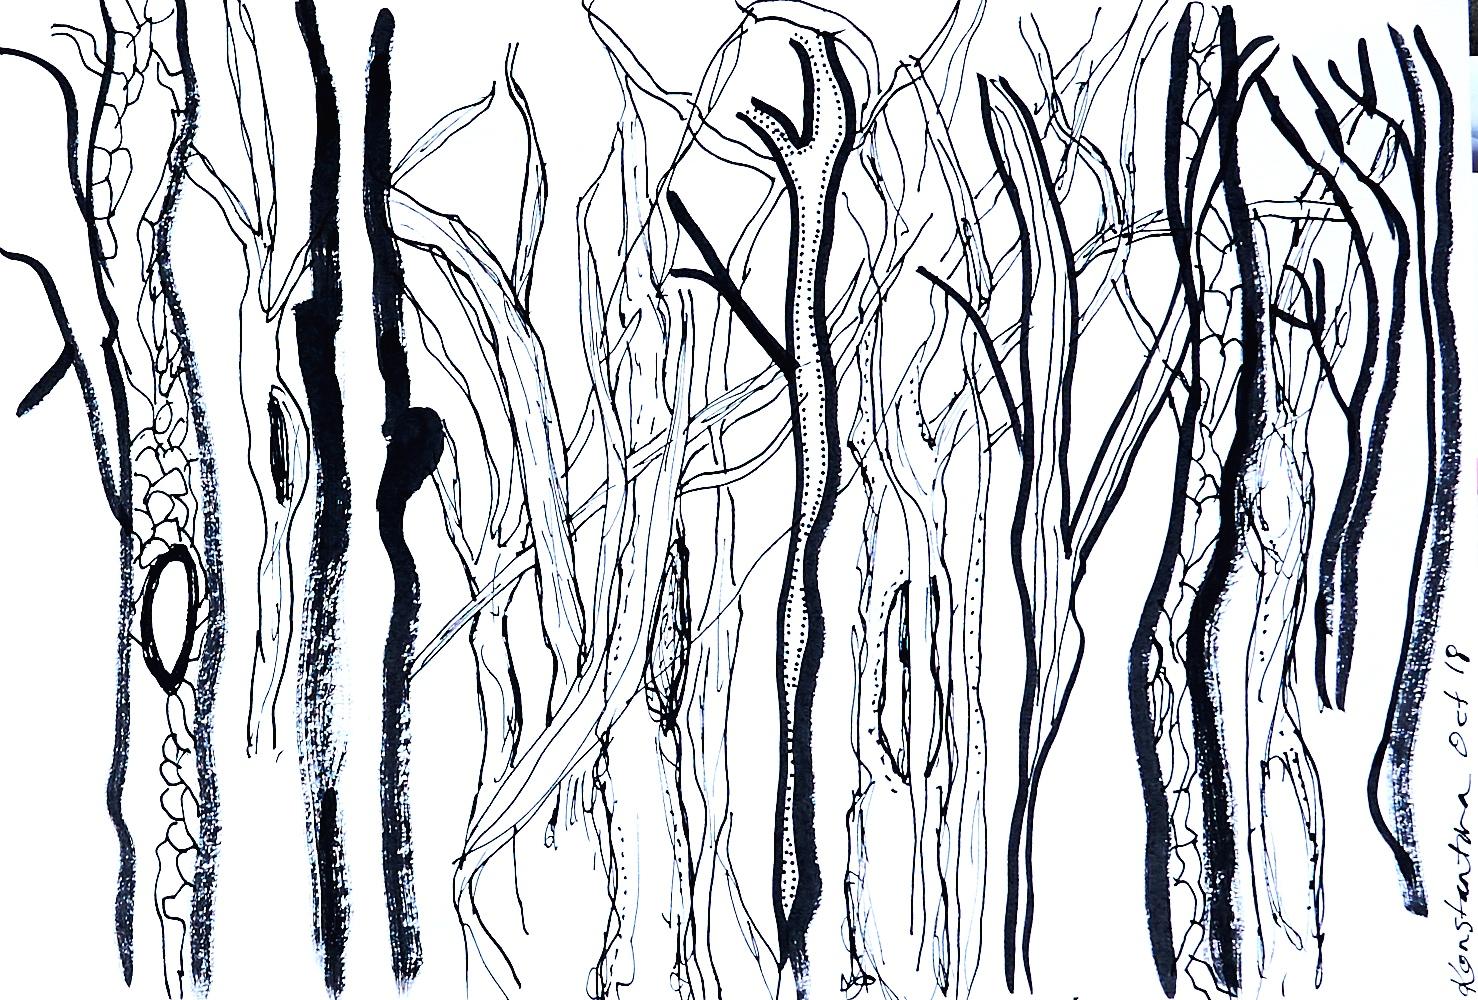 WANDER - work on paper; acrylic paint pen29.7cm x 21cmOctober 2018